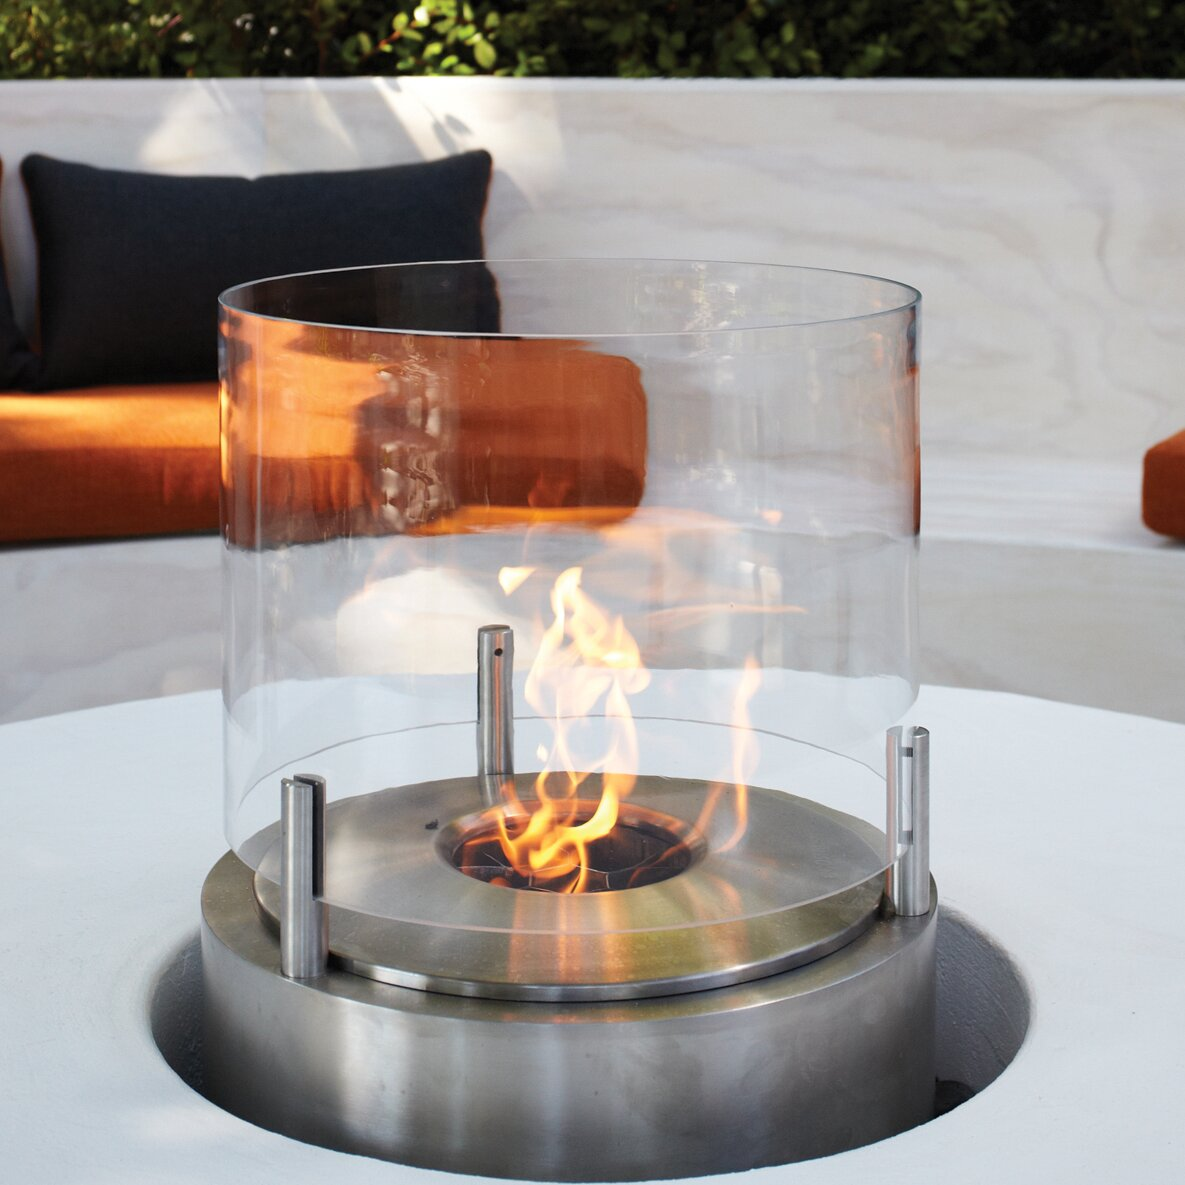 ecosmart fire cyl bio ethanol tabletop fireplace wayfair. Black Bedroom Furniture Sets. Home Design Ideas